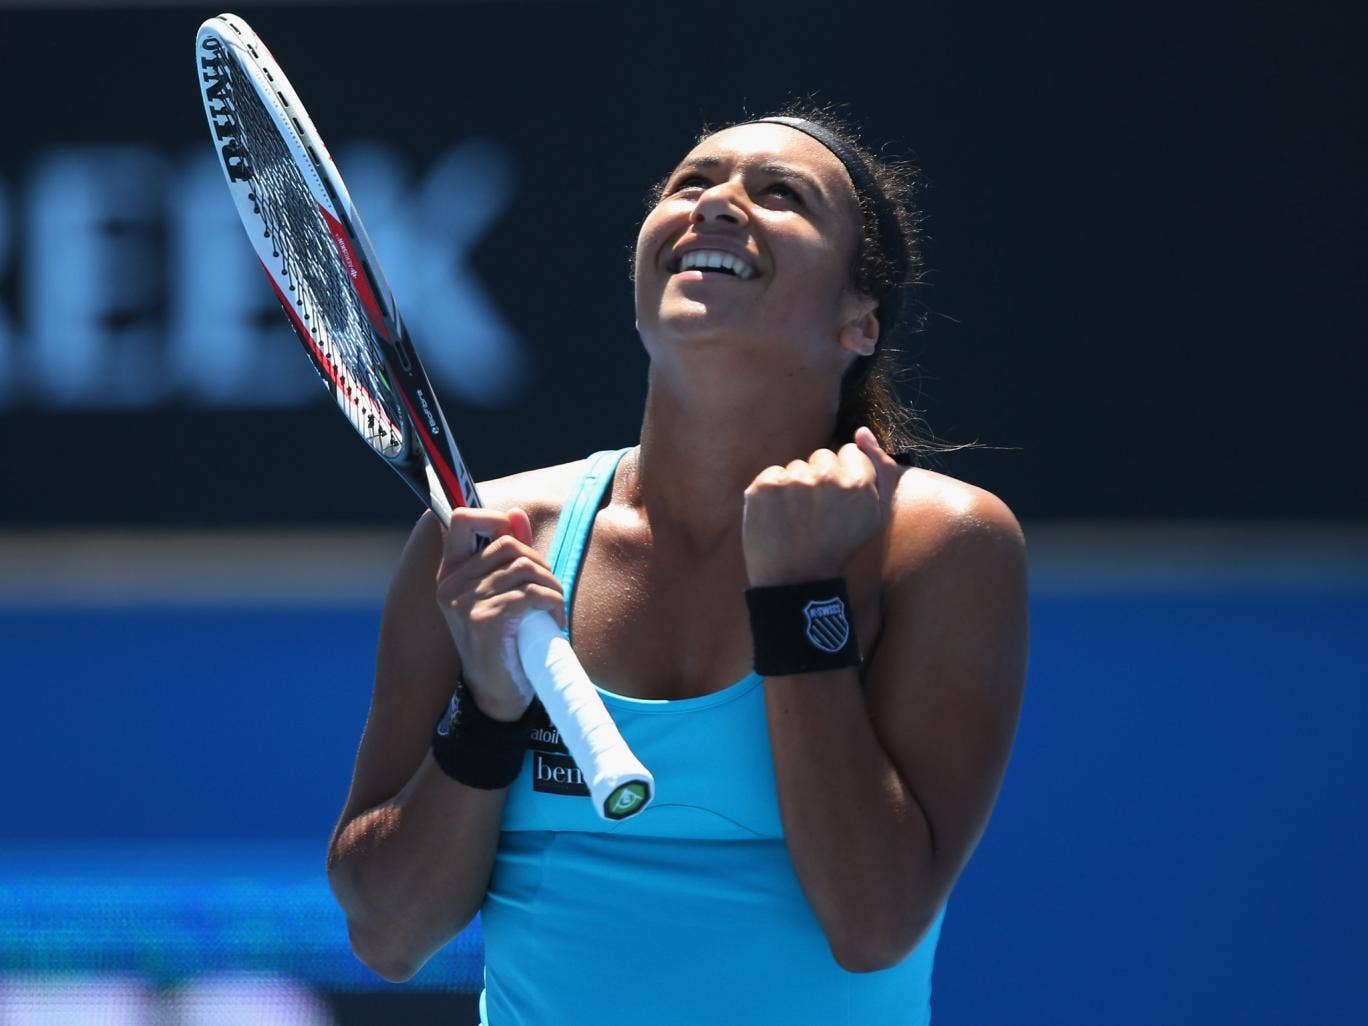 Heather Watson progressed tot he Australian Open main draw after beating Irina Falconi